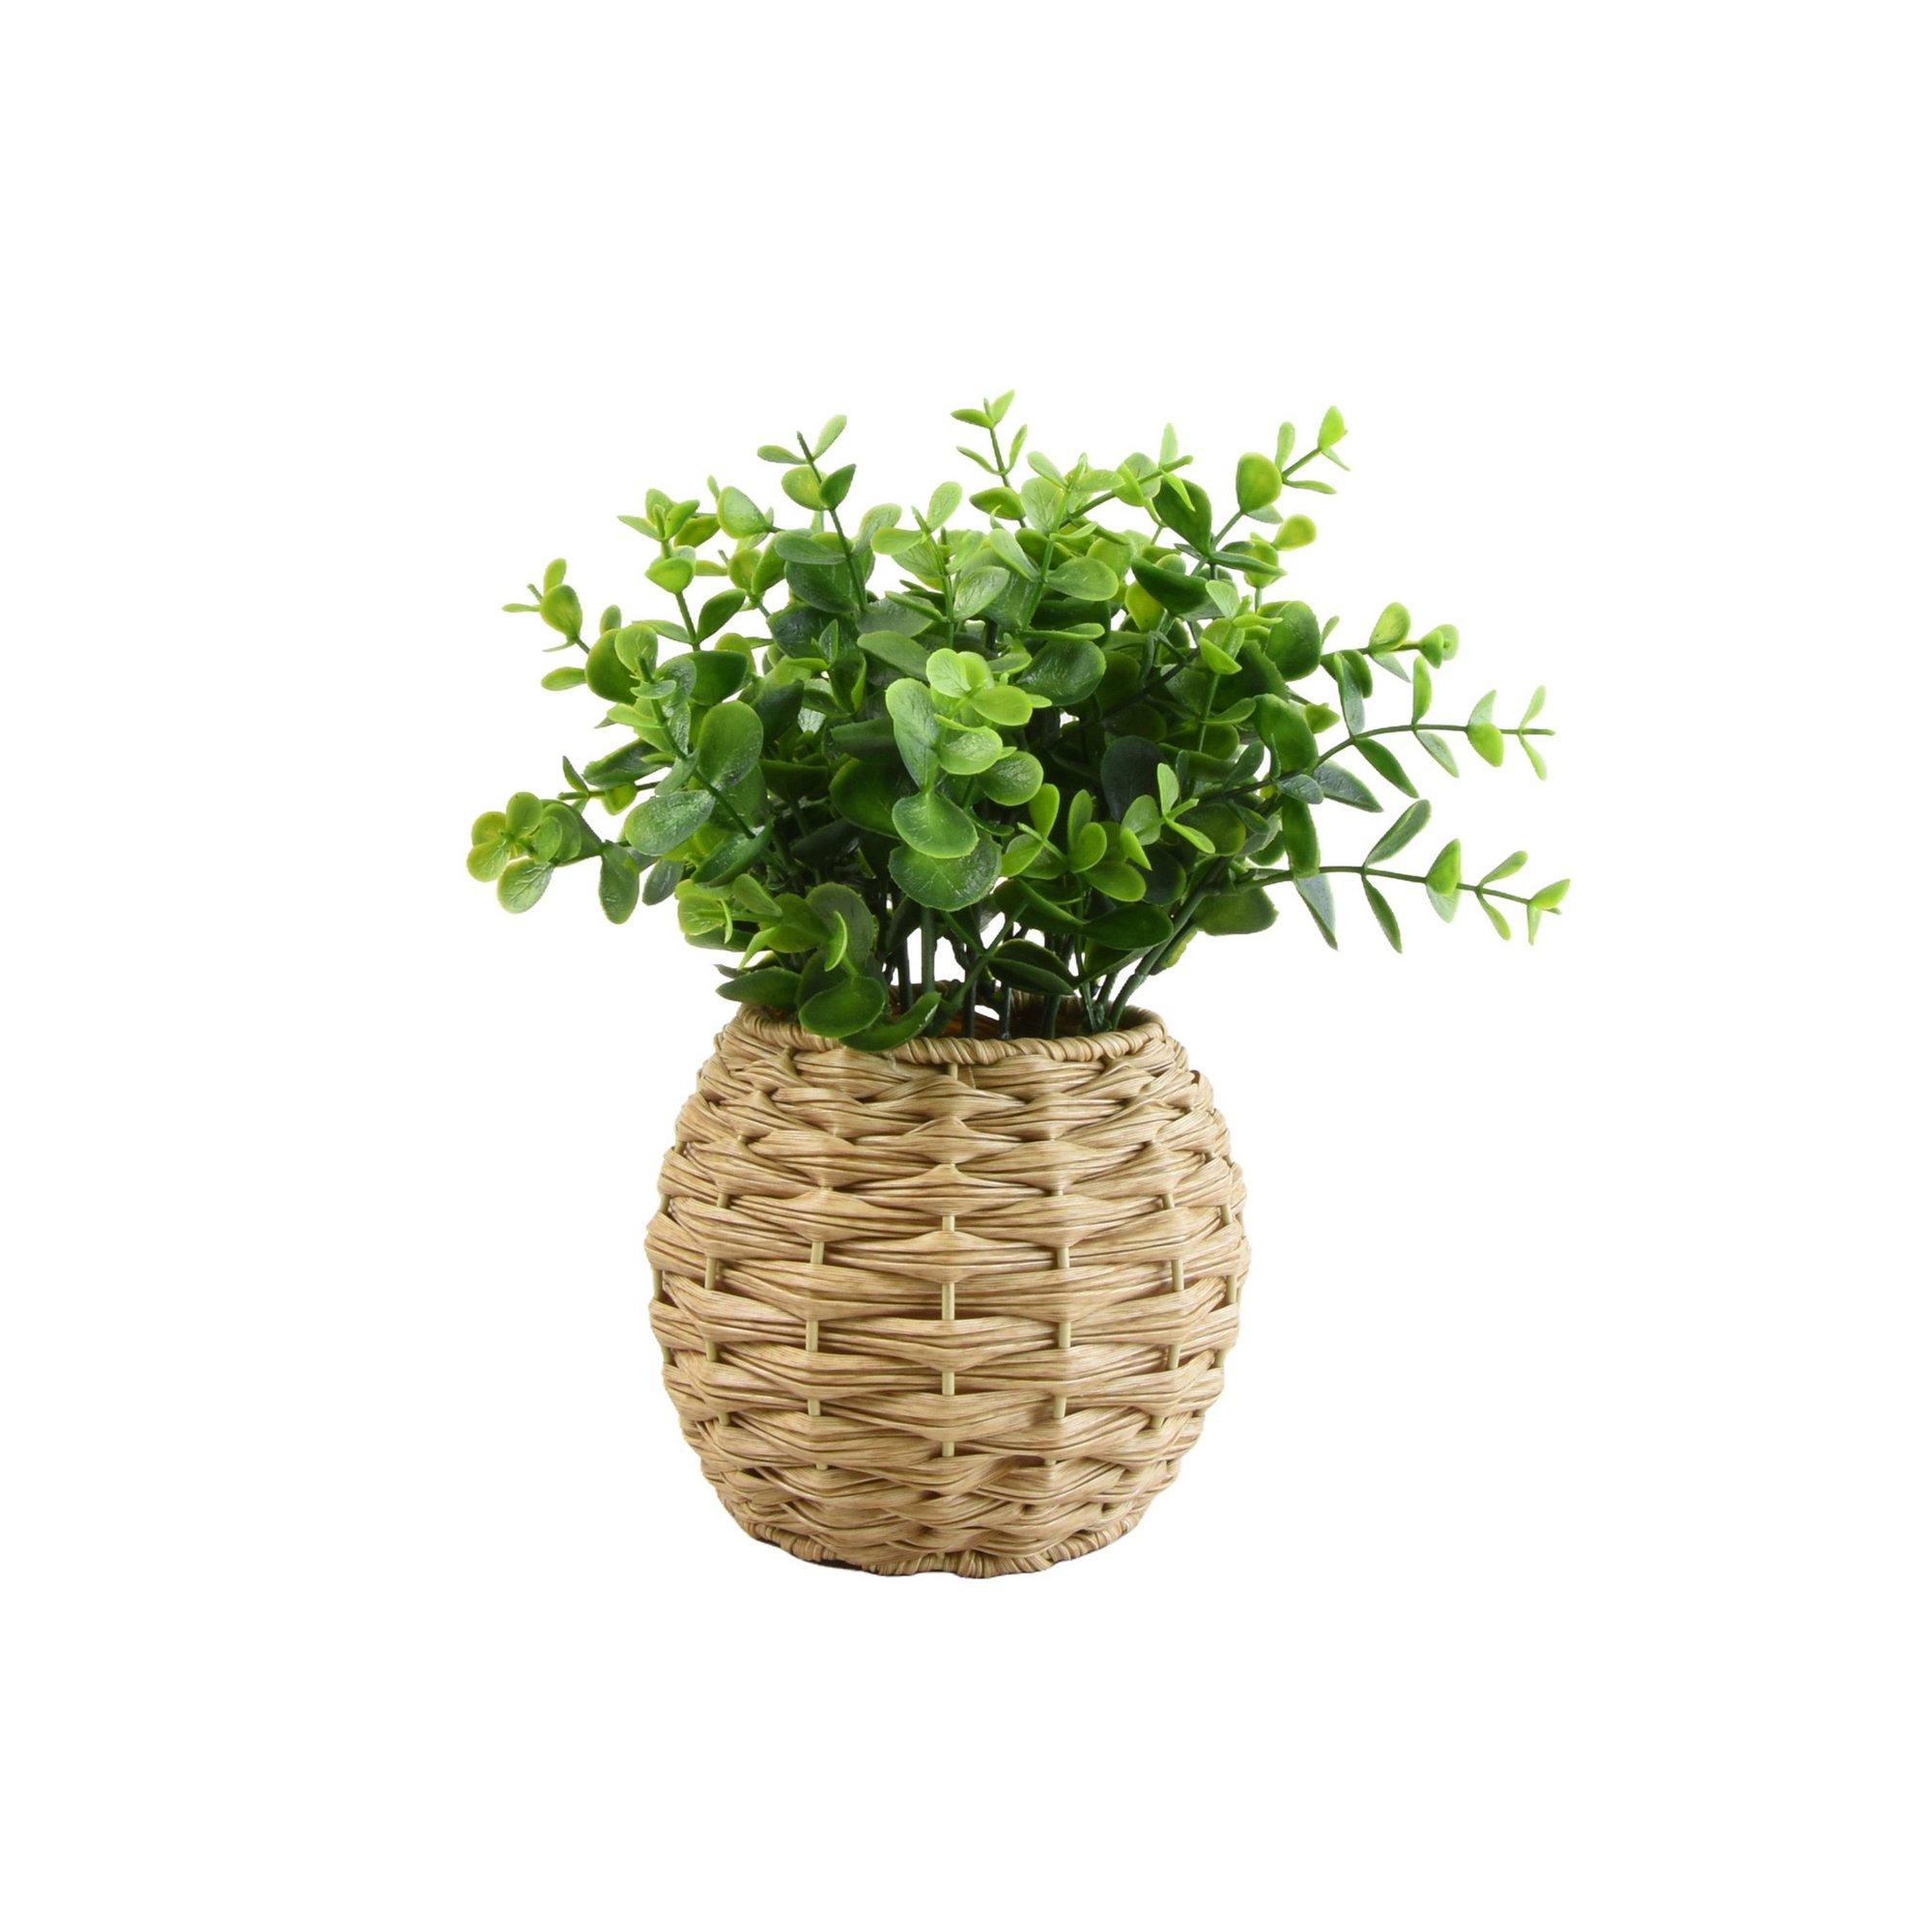 Image of Herbs in Rattan Pot